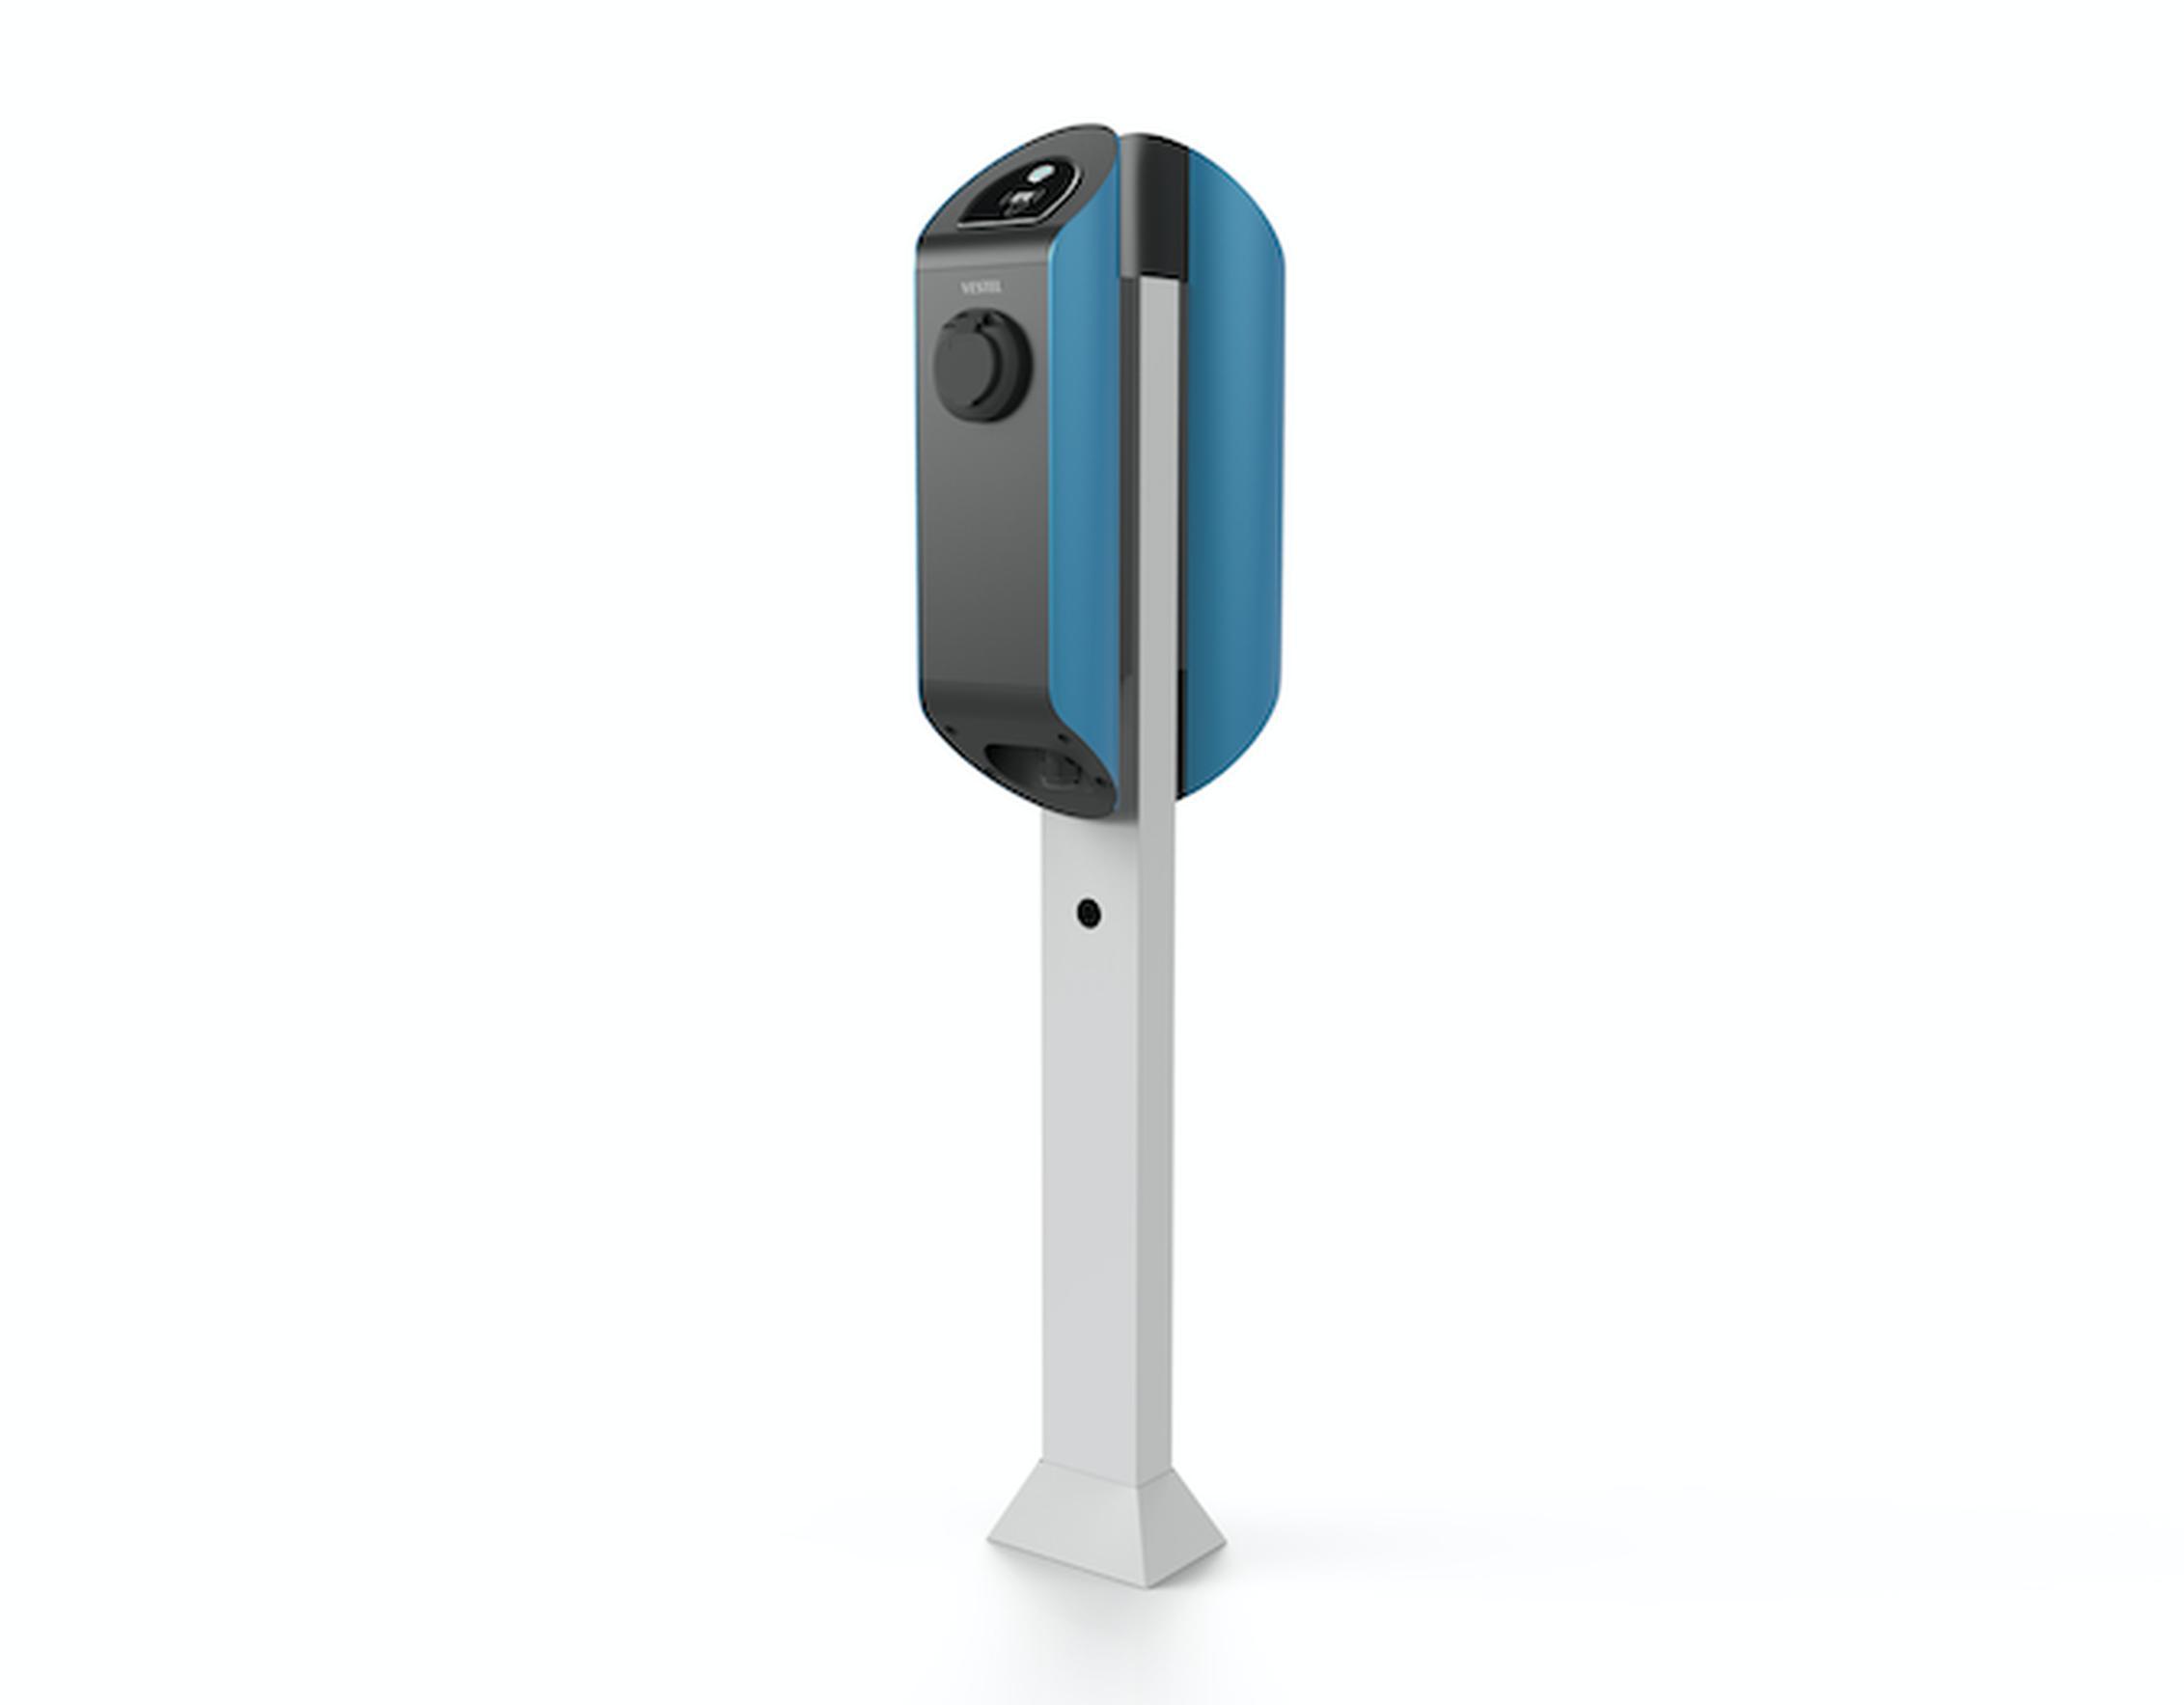 Accesorio Vestel Pole / Columna Pie